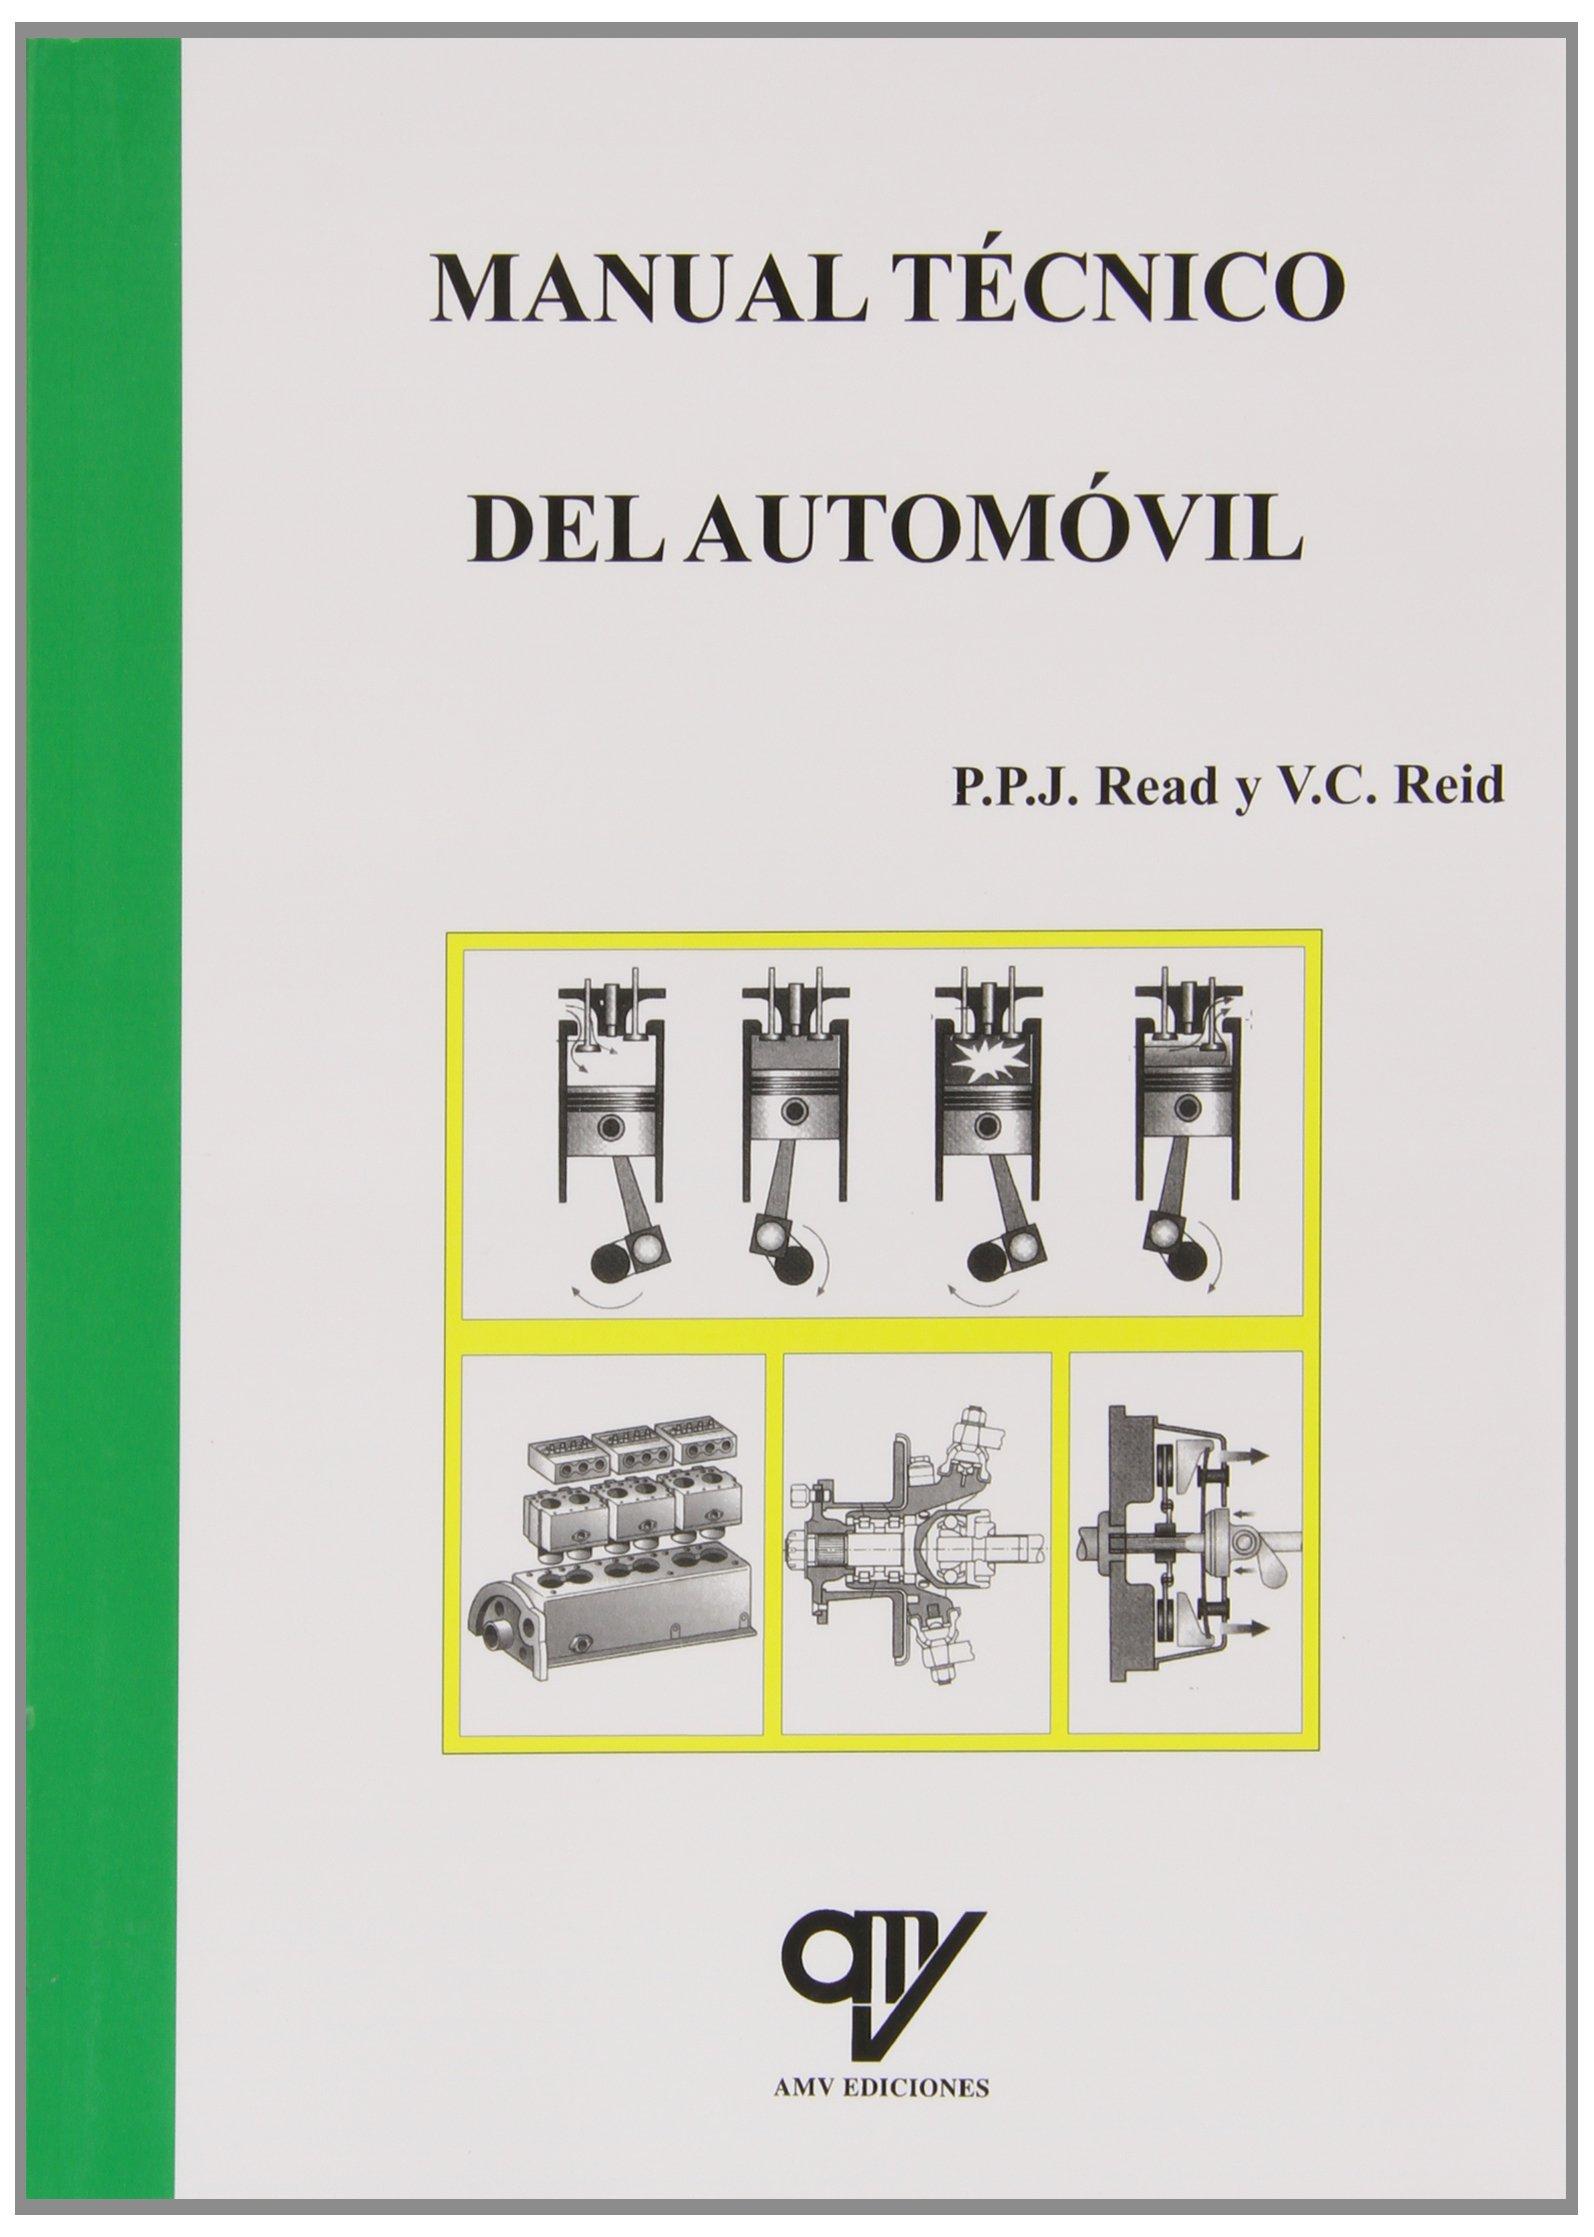 Manual técnico del automóvil (Spanish) Paperback – January 1, 2001